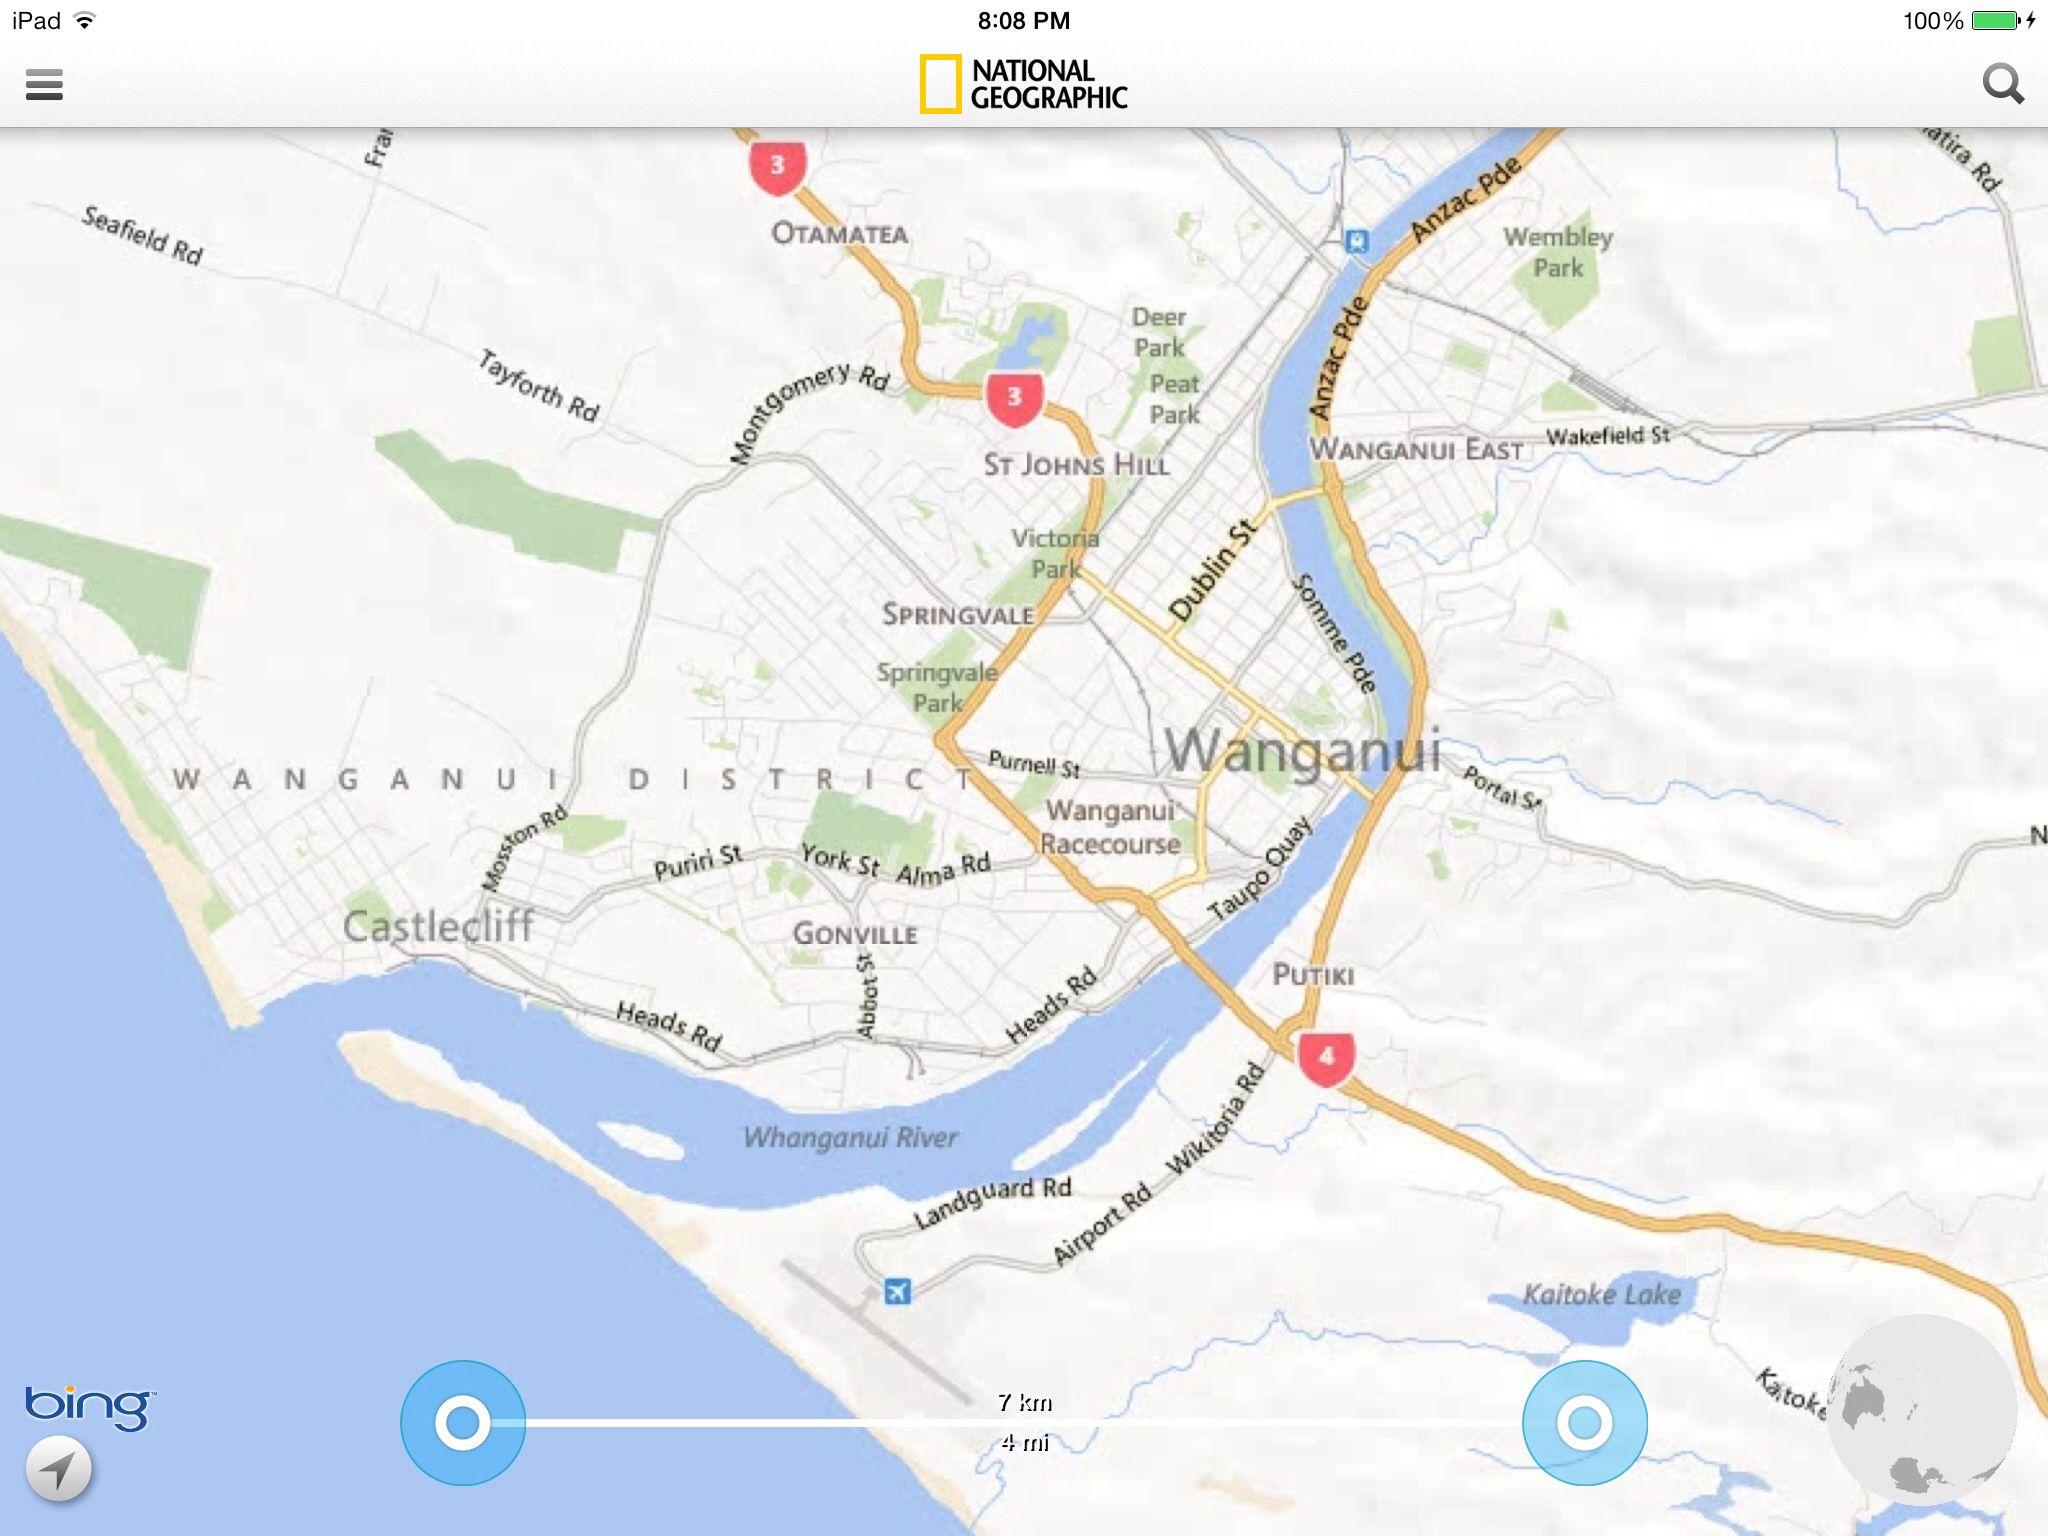 Wanganui New Zealand Map.Map Of Wanganui New Zealand Kiwi Land New Zealand New